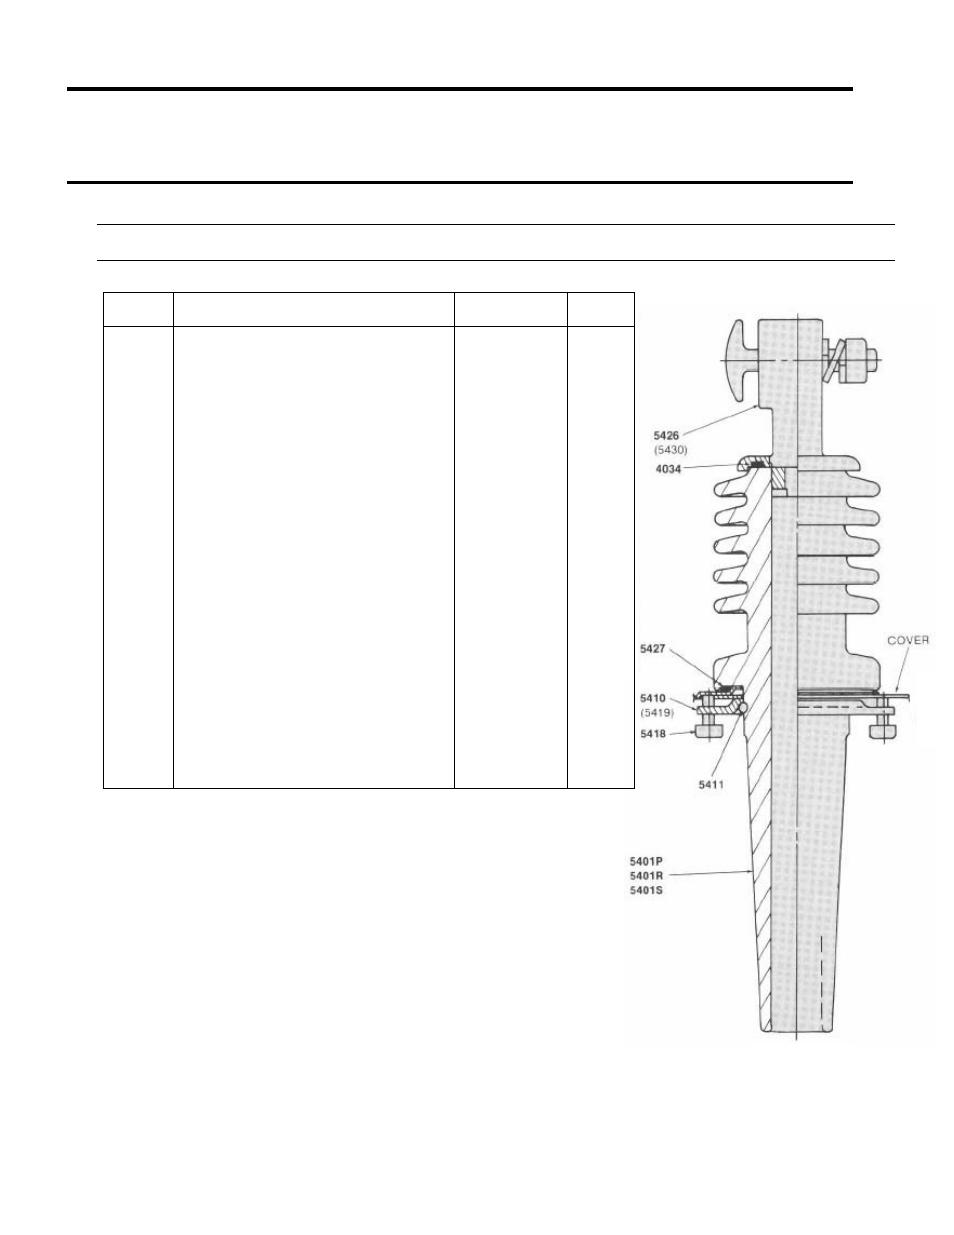 hight resolution of parts list siemens jfr distribution step voltage regulator 21 115532 001 user manual page 26 28